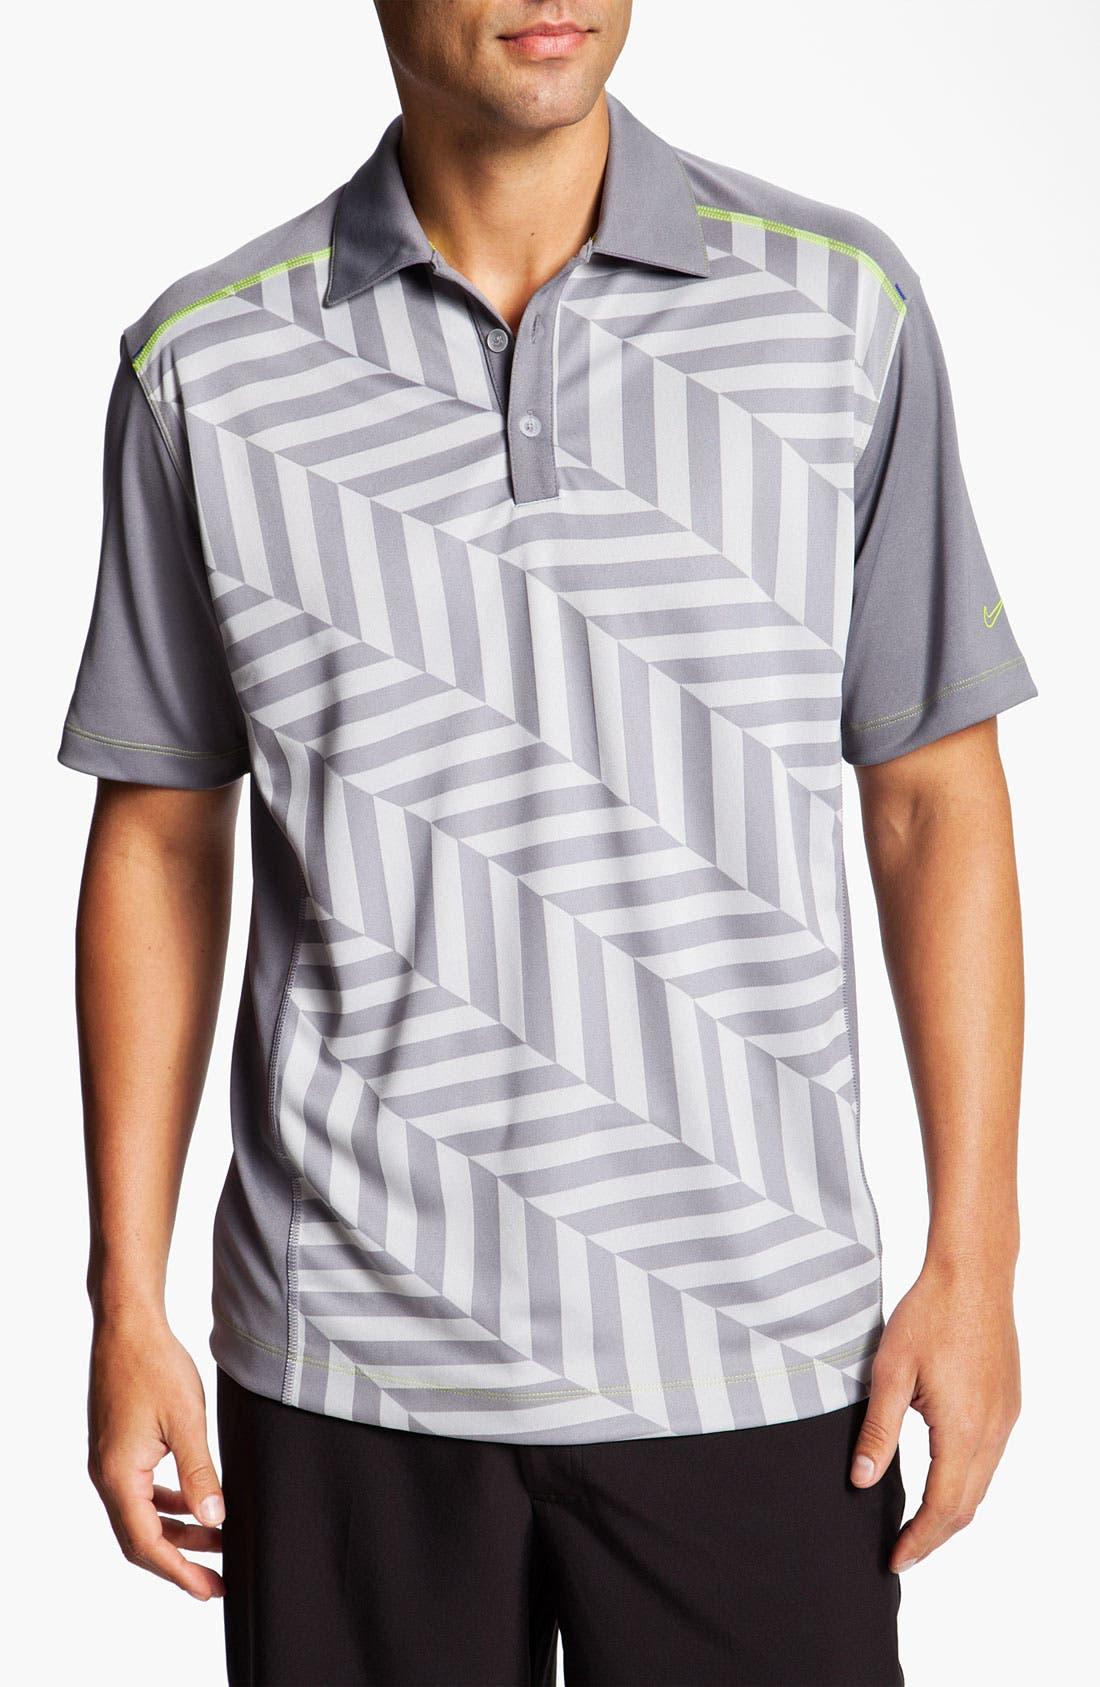 Alternate Image 1 Selected - Nike Golf 'Herringbone Jacquard' Dri-FIT Polo